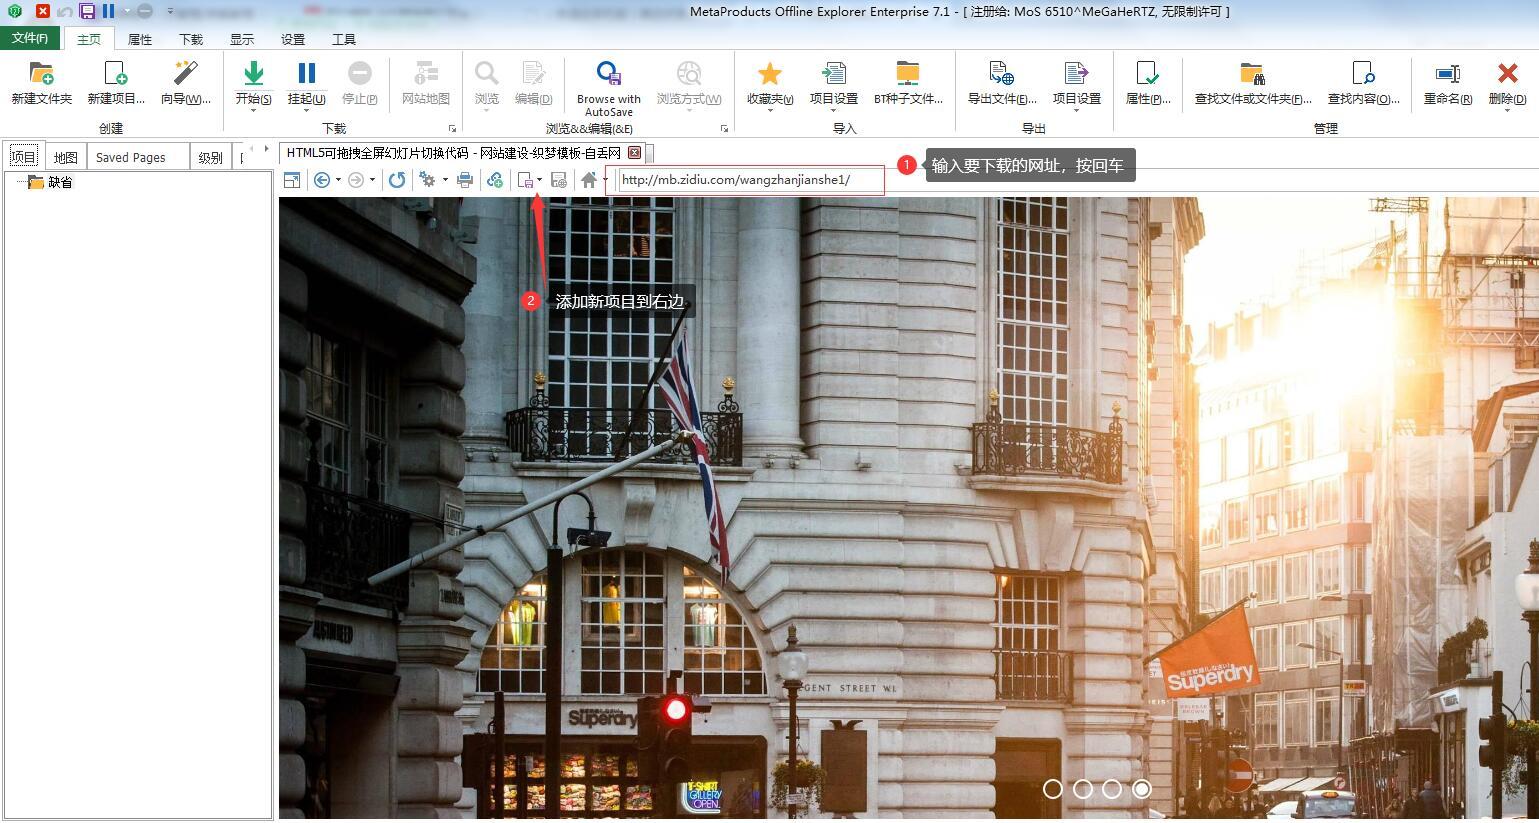 Offline Explorer Enterprise整站网页下载详细图文教程附软件